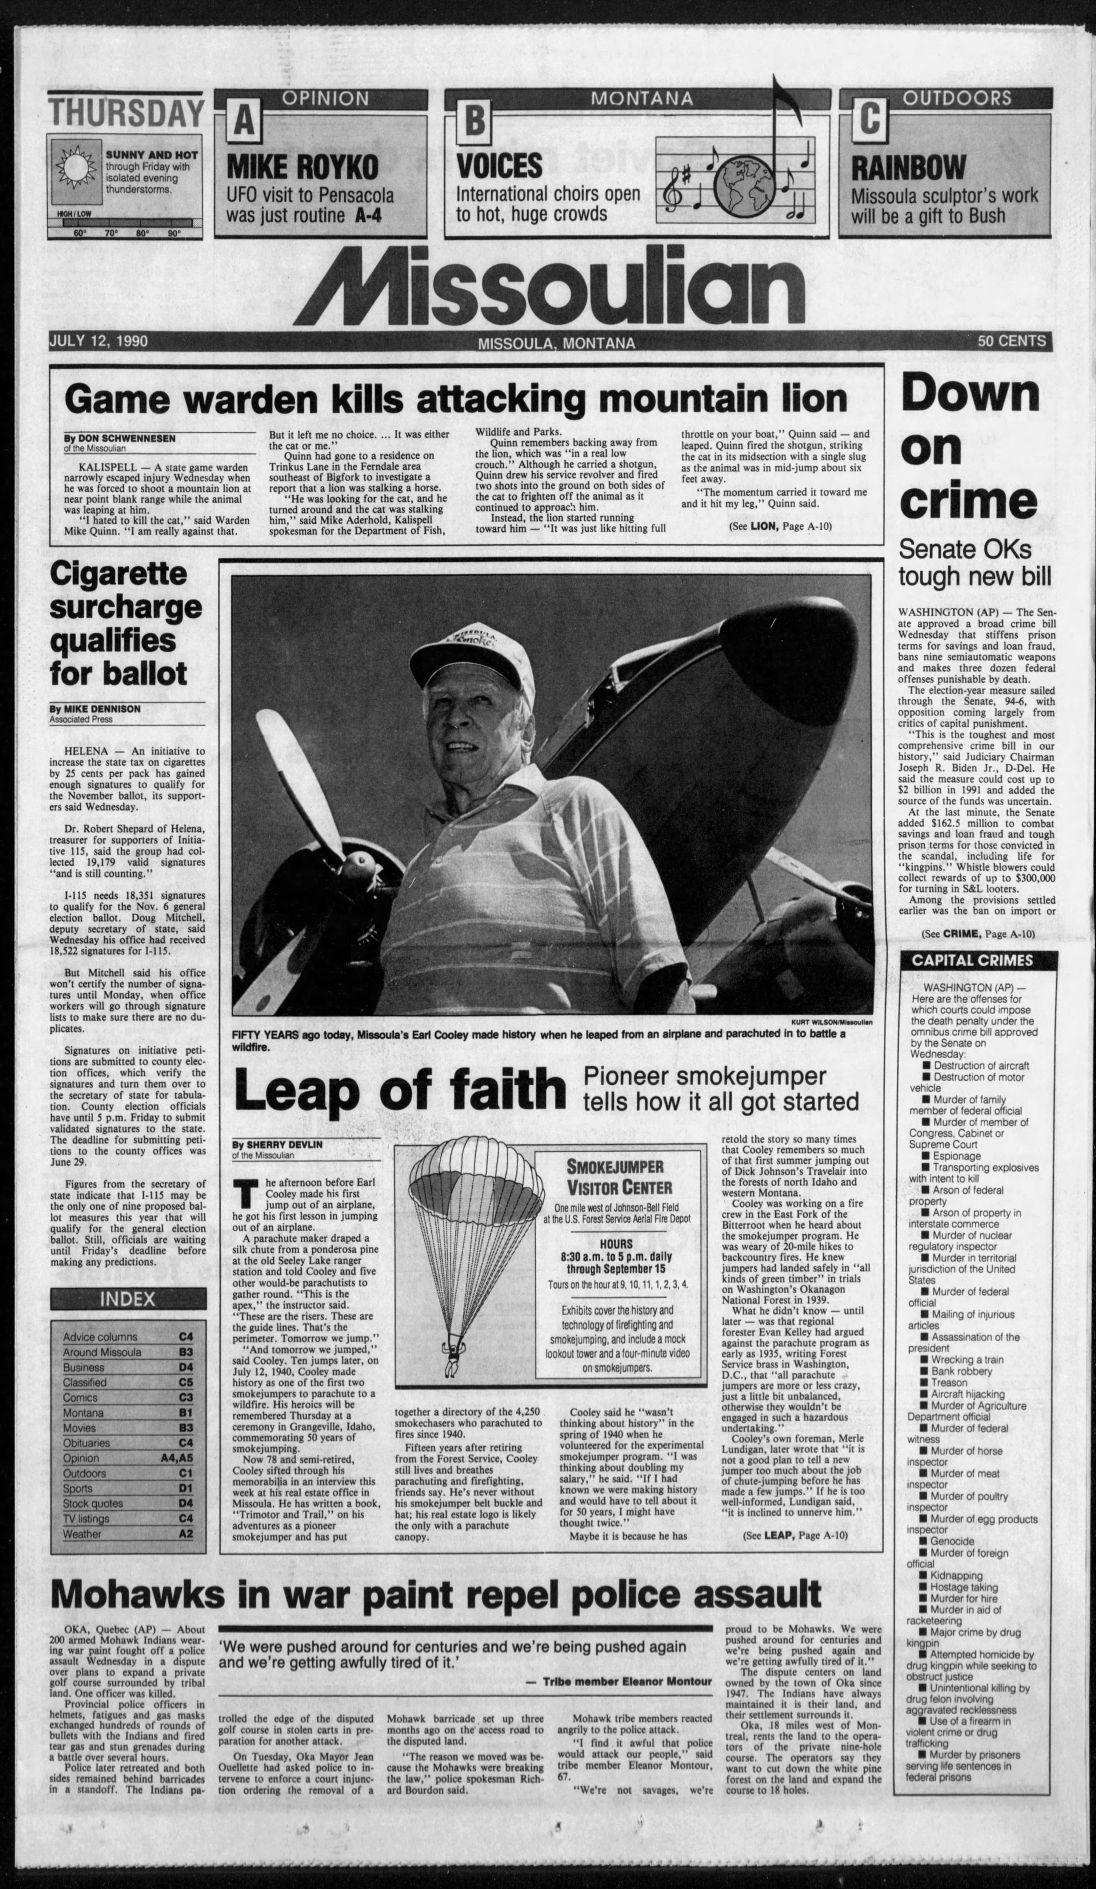 The_Missoulian_Thu__Jul_12__1990_.jpg